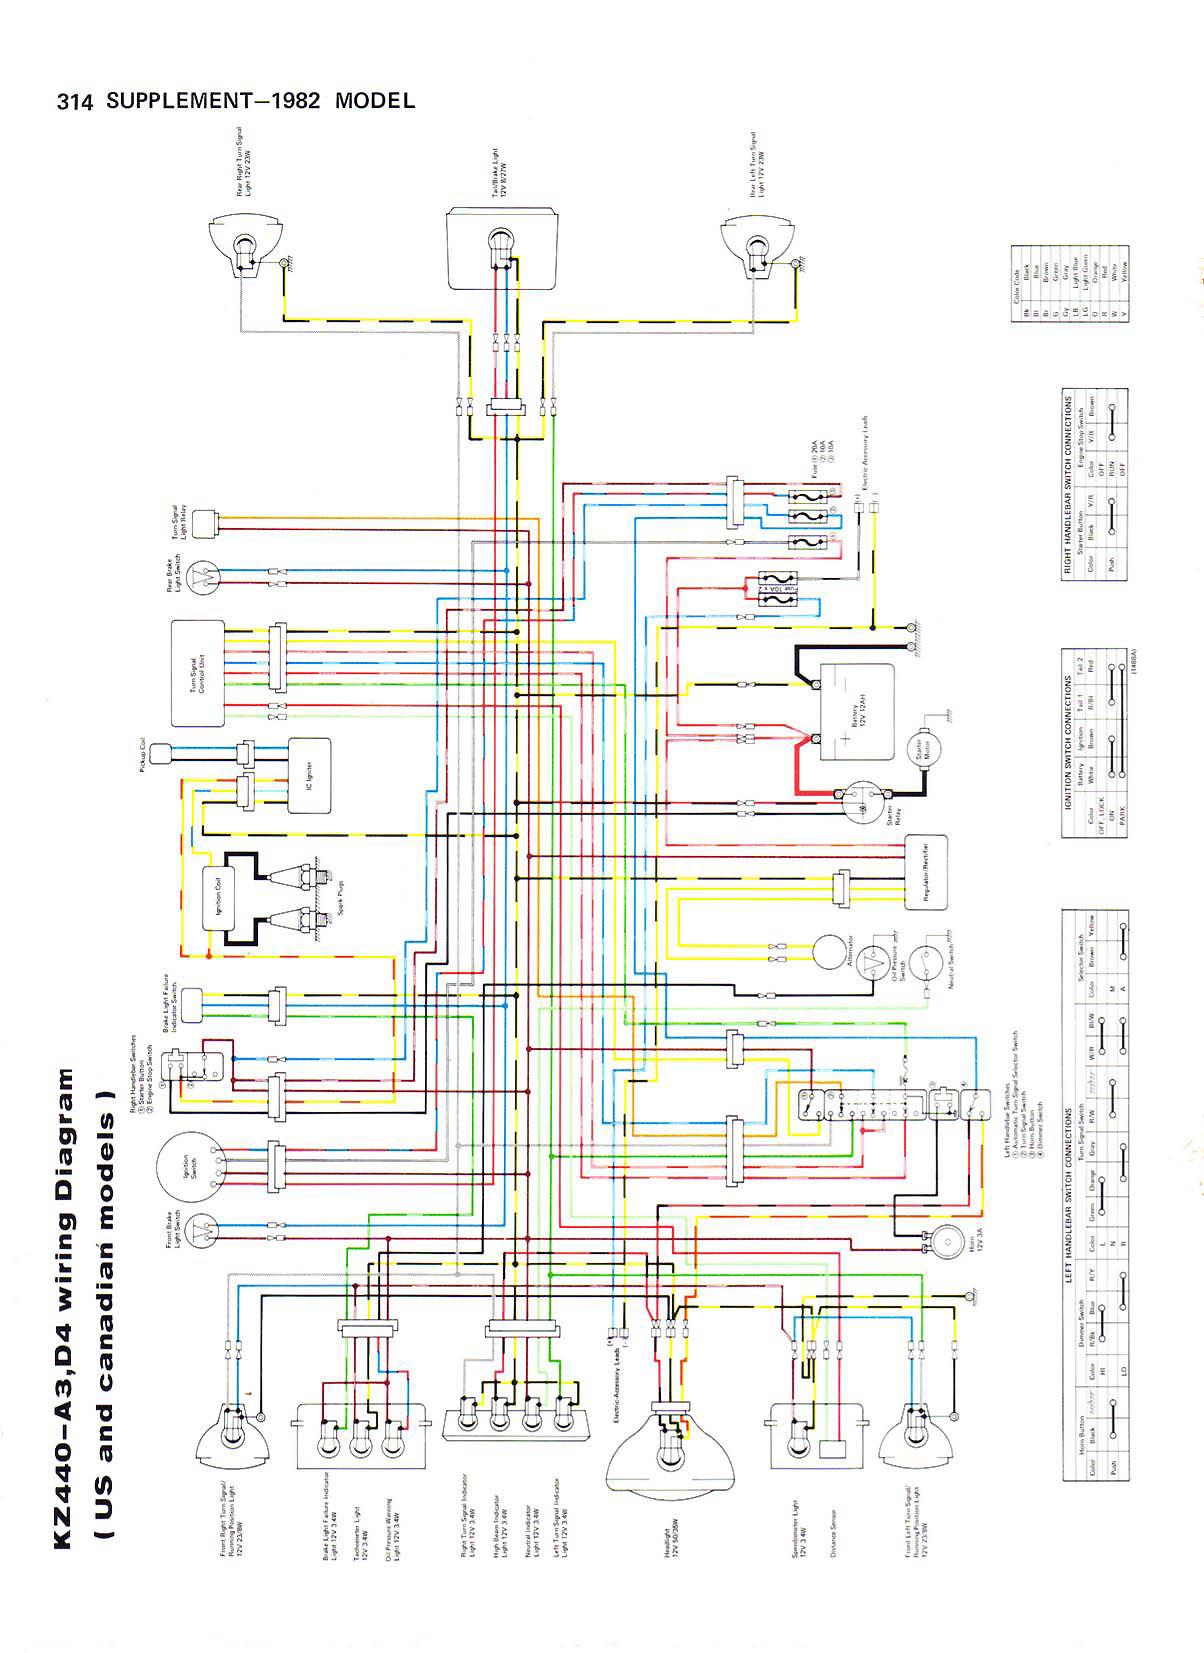 1975 Kawasaki G5 100 Wiring Diagram -83 Silverado Fuse Diagram | Begeboy Wiring  Diagram SourceBegeboy Wiring Diagram Source